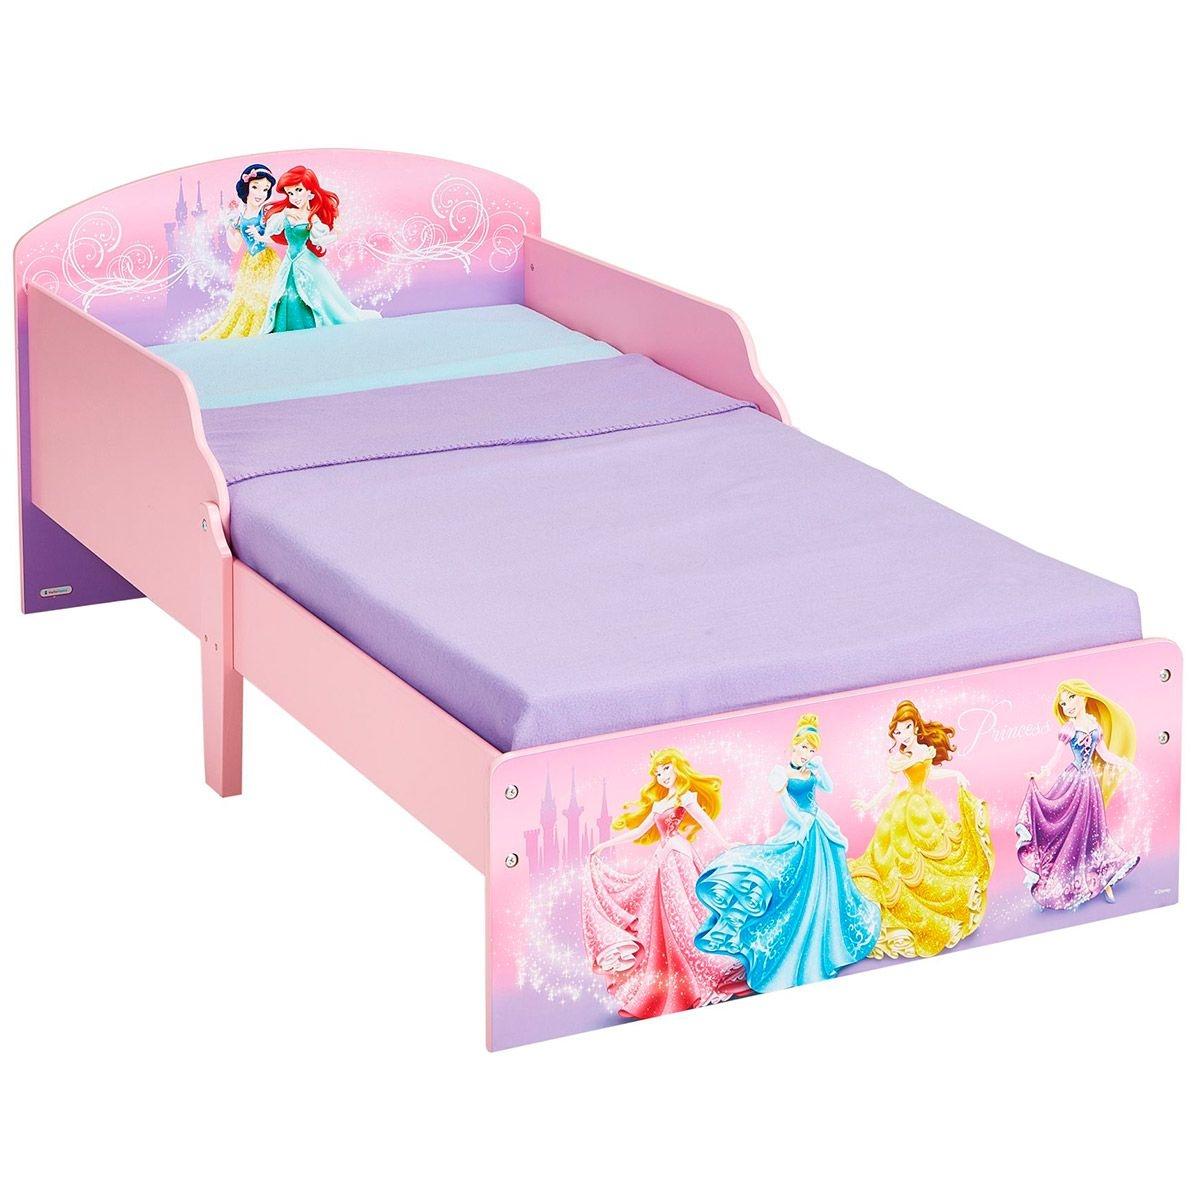 Lit Ptit Bed Princesse Disney